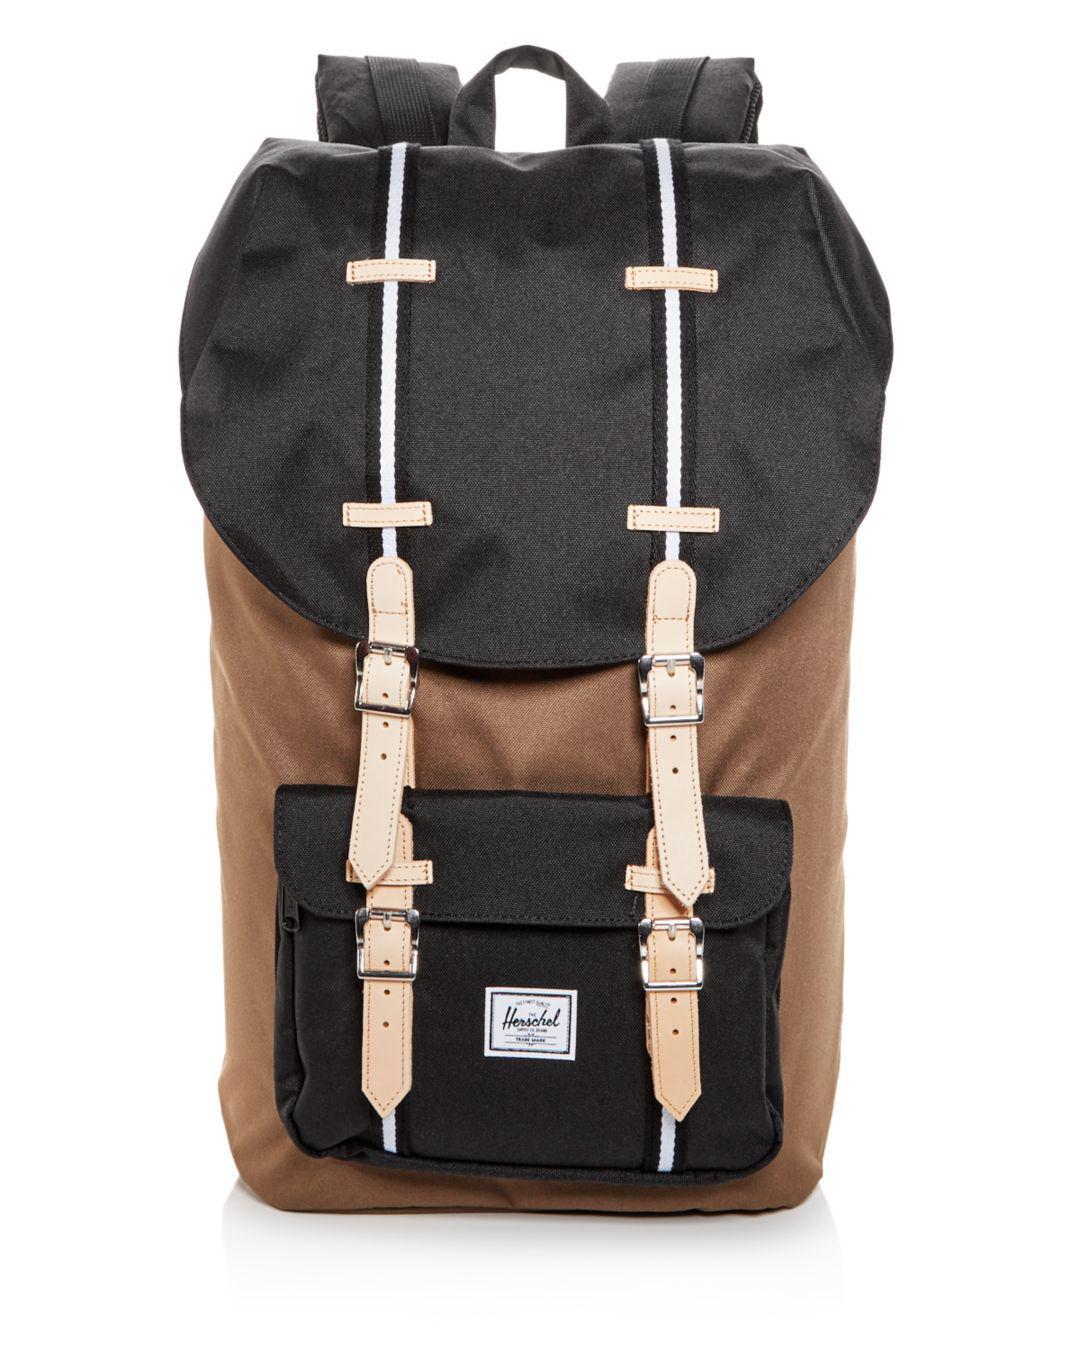 64850a56634 Lyst - Herschel Supply Co. Classic Little America Backpack in Black ...